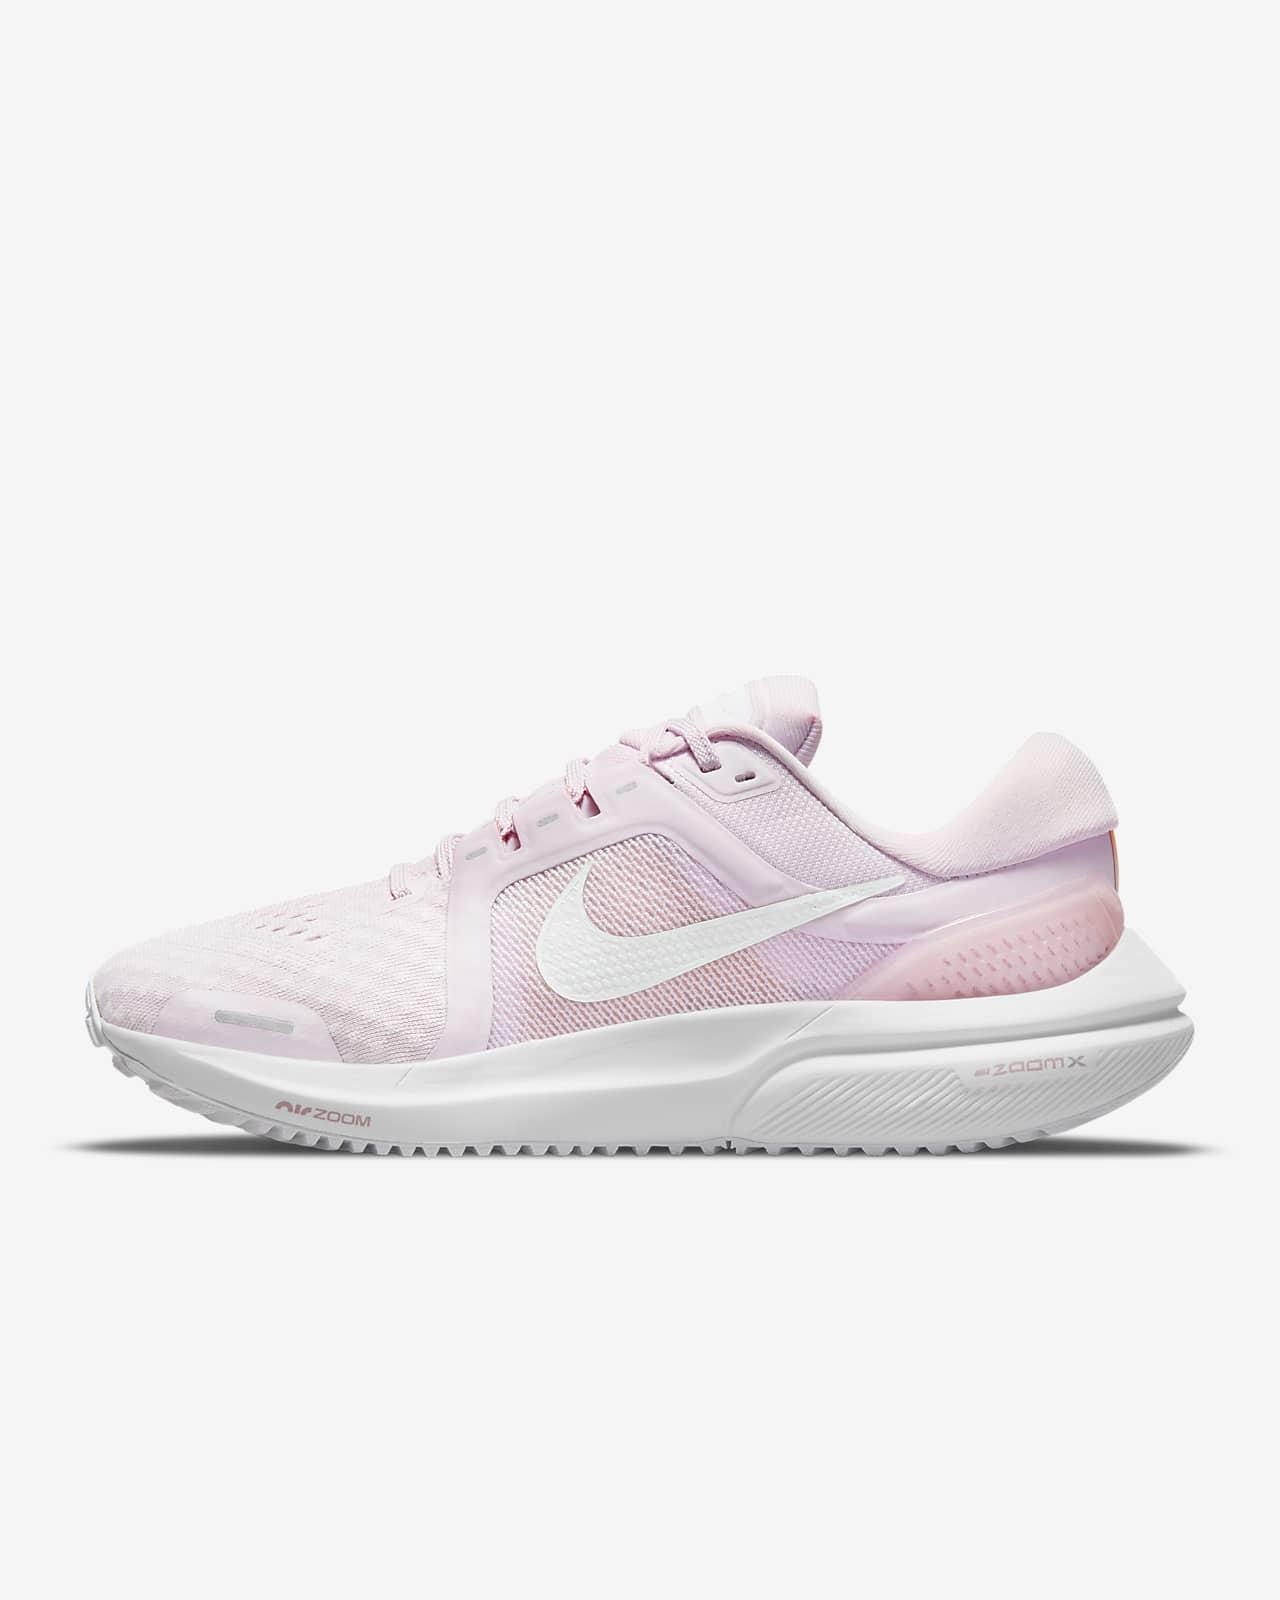 Scarpa da running su asfalto Nike Air Zoom Vomero 16 - Donna